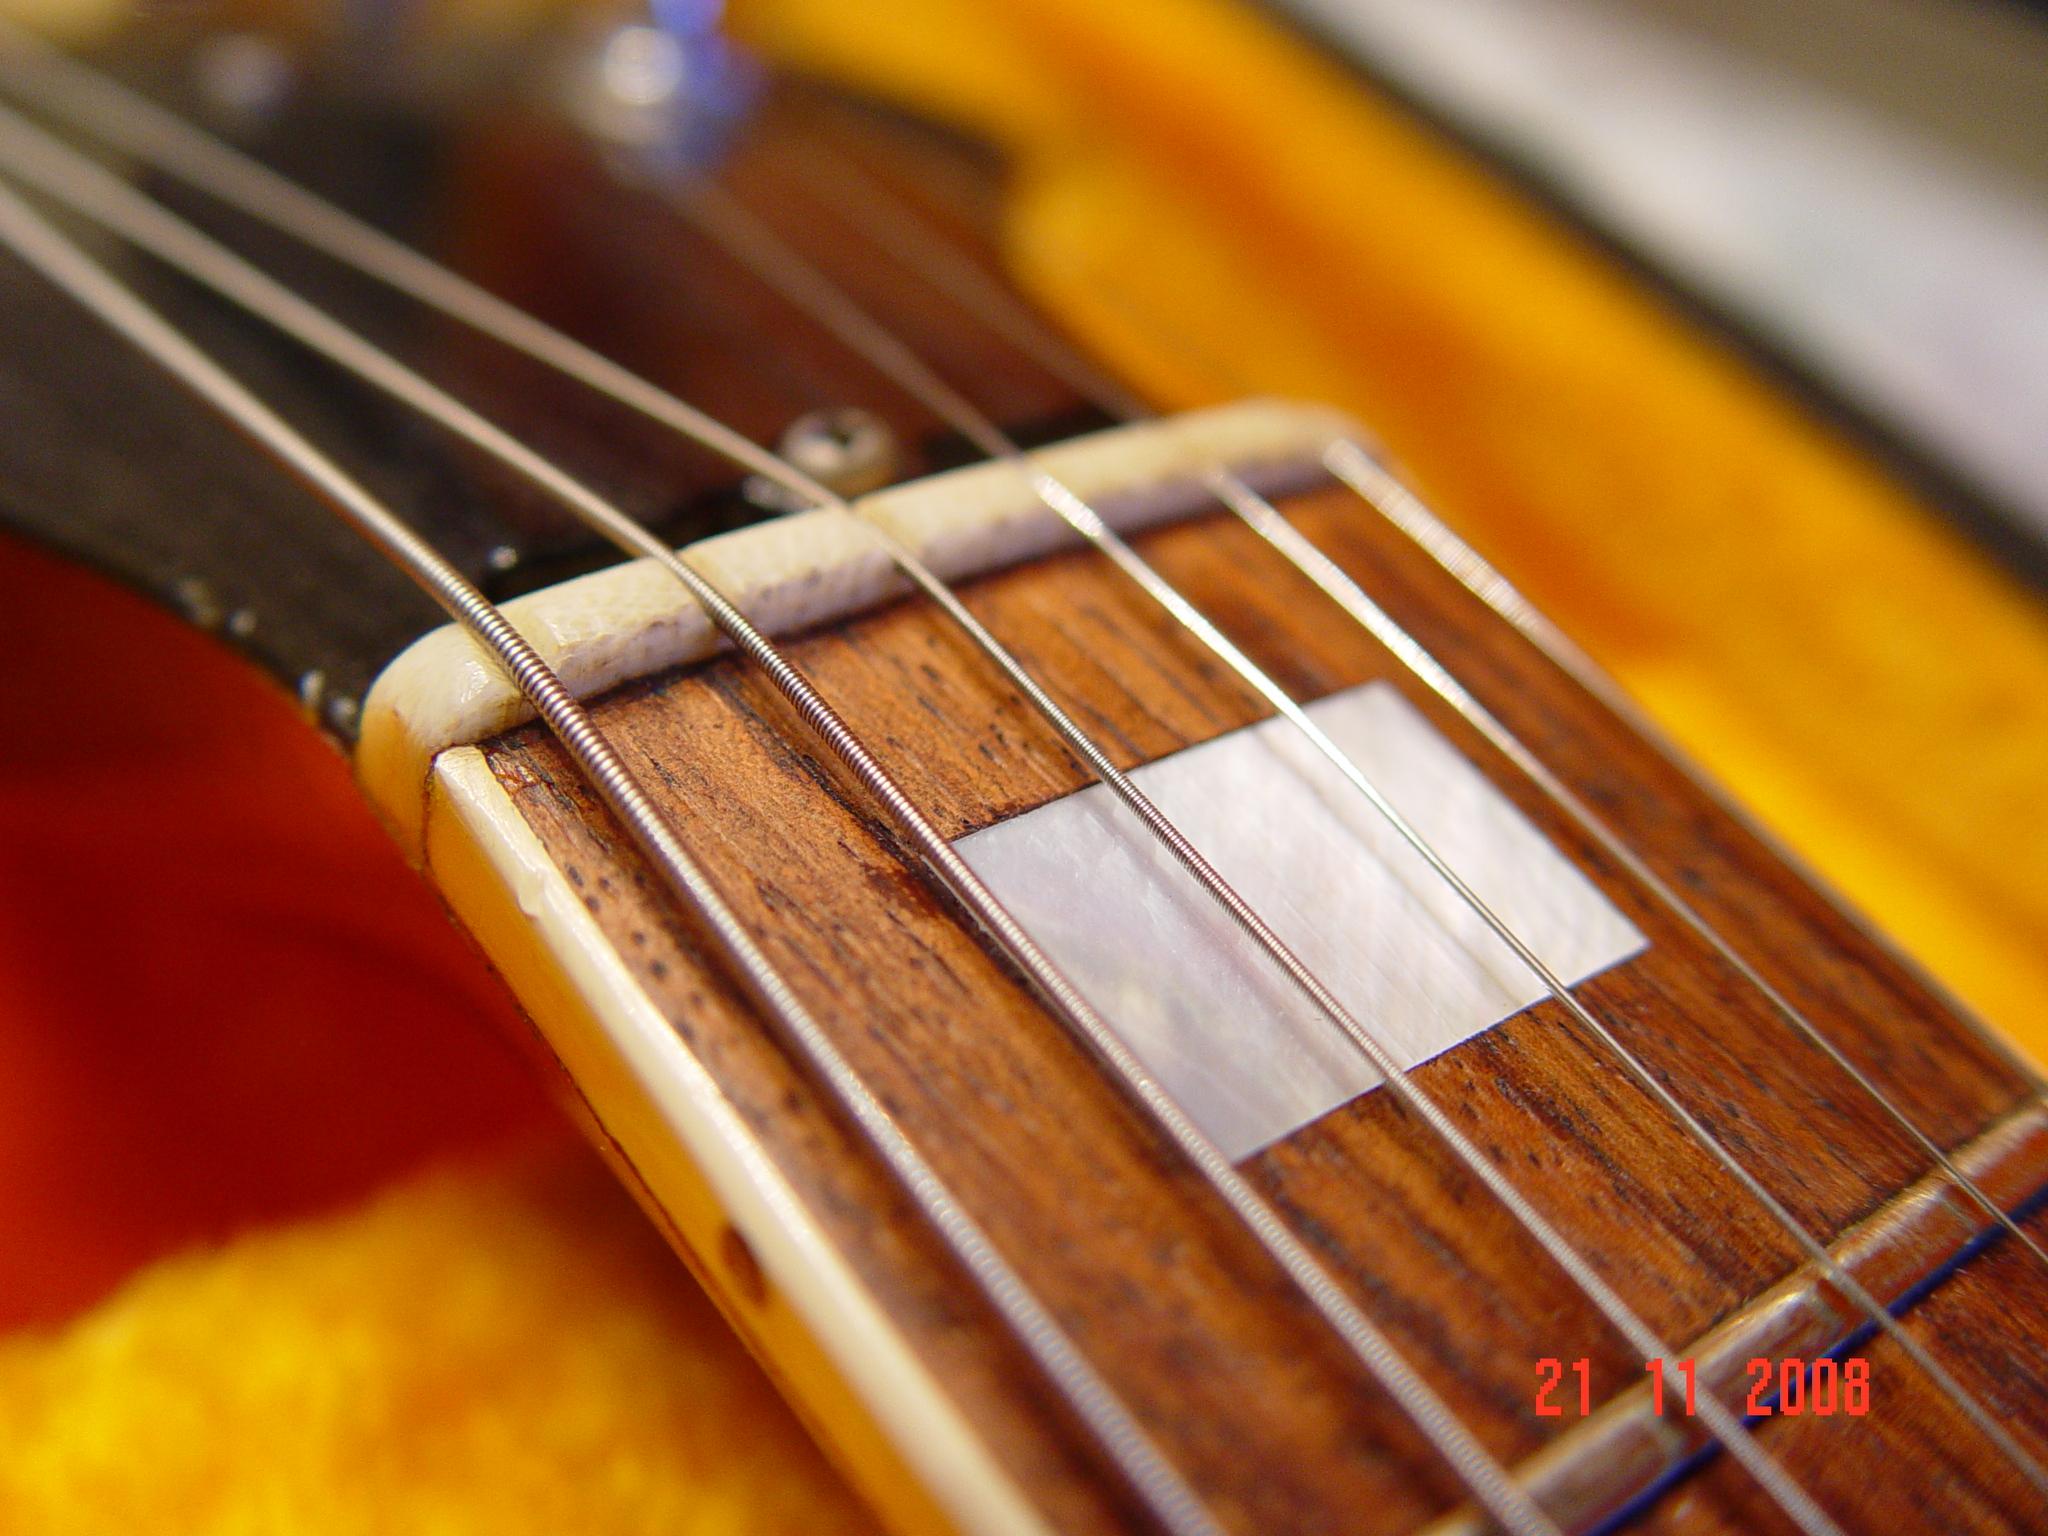 Nut Fretless Wonder Vintage Gibson SG Deluxe